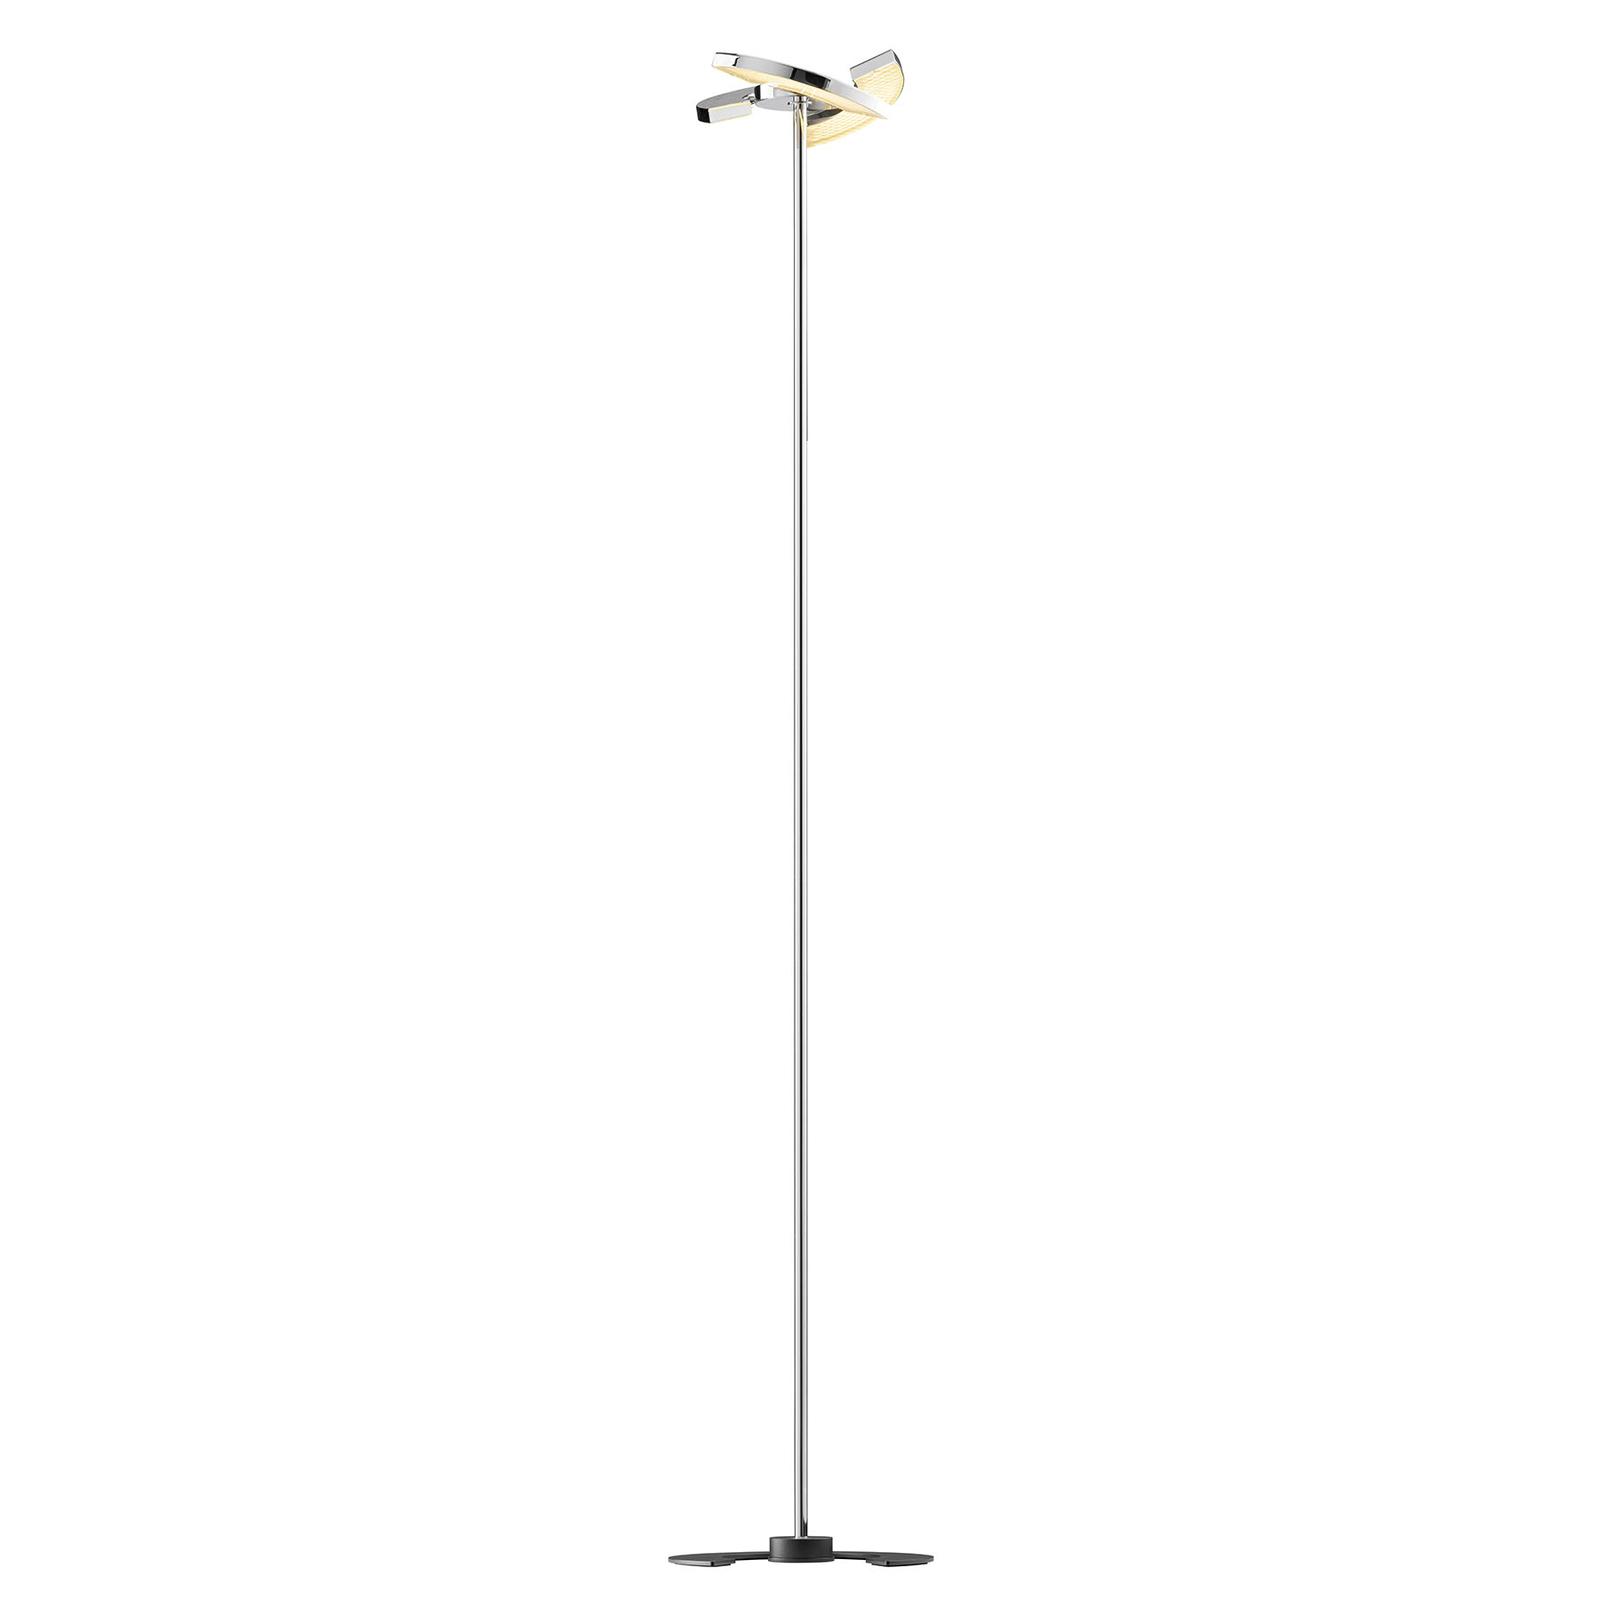 OLIGO Trinity LED-gulvlampe, 3 bevegelige segment